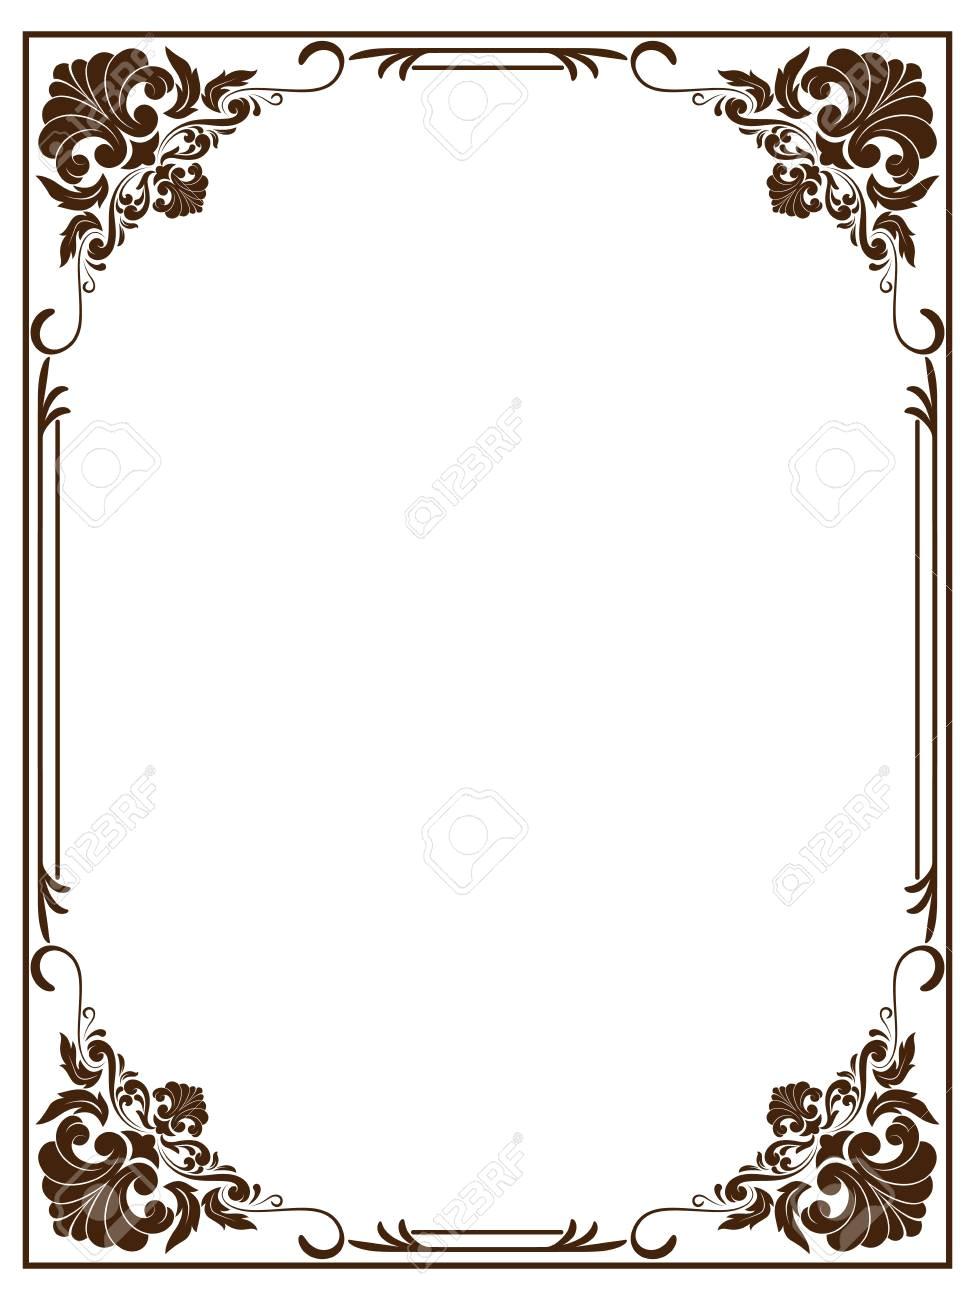 109668088 decorative frame in vintage style with beautiful filigree and retro border for premium invitation ca jpg